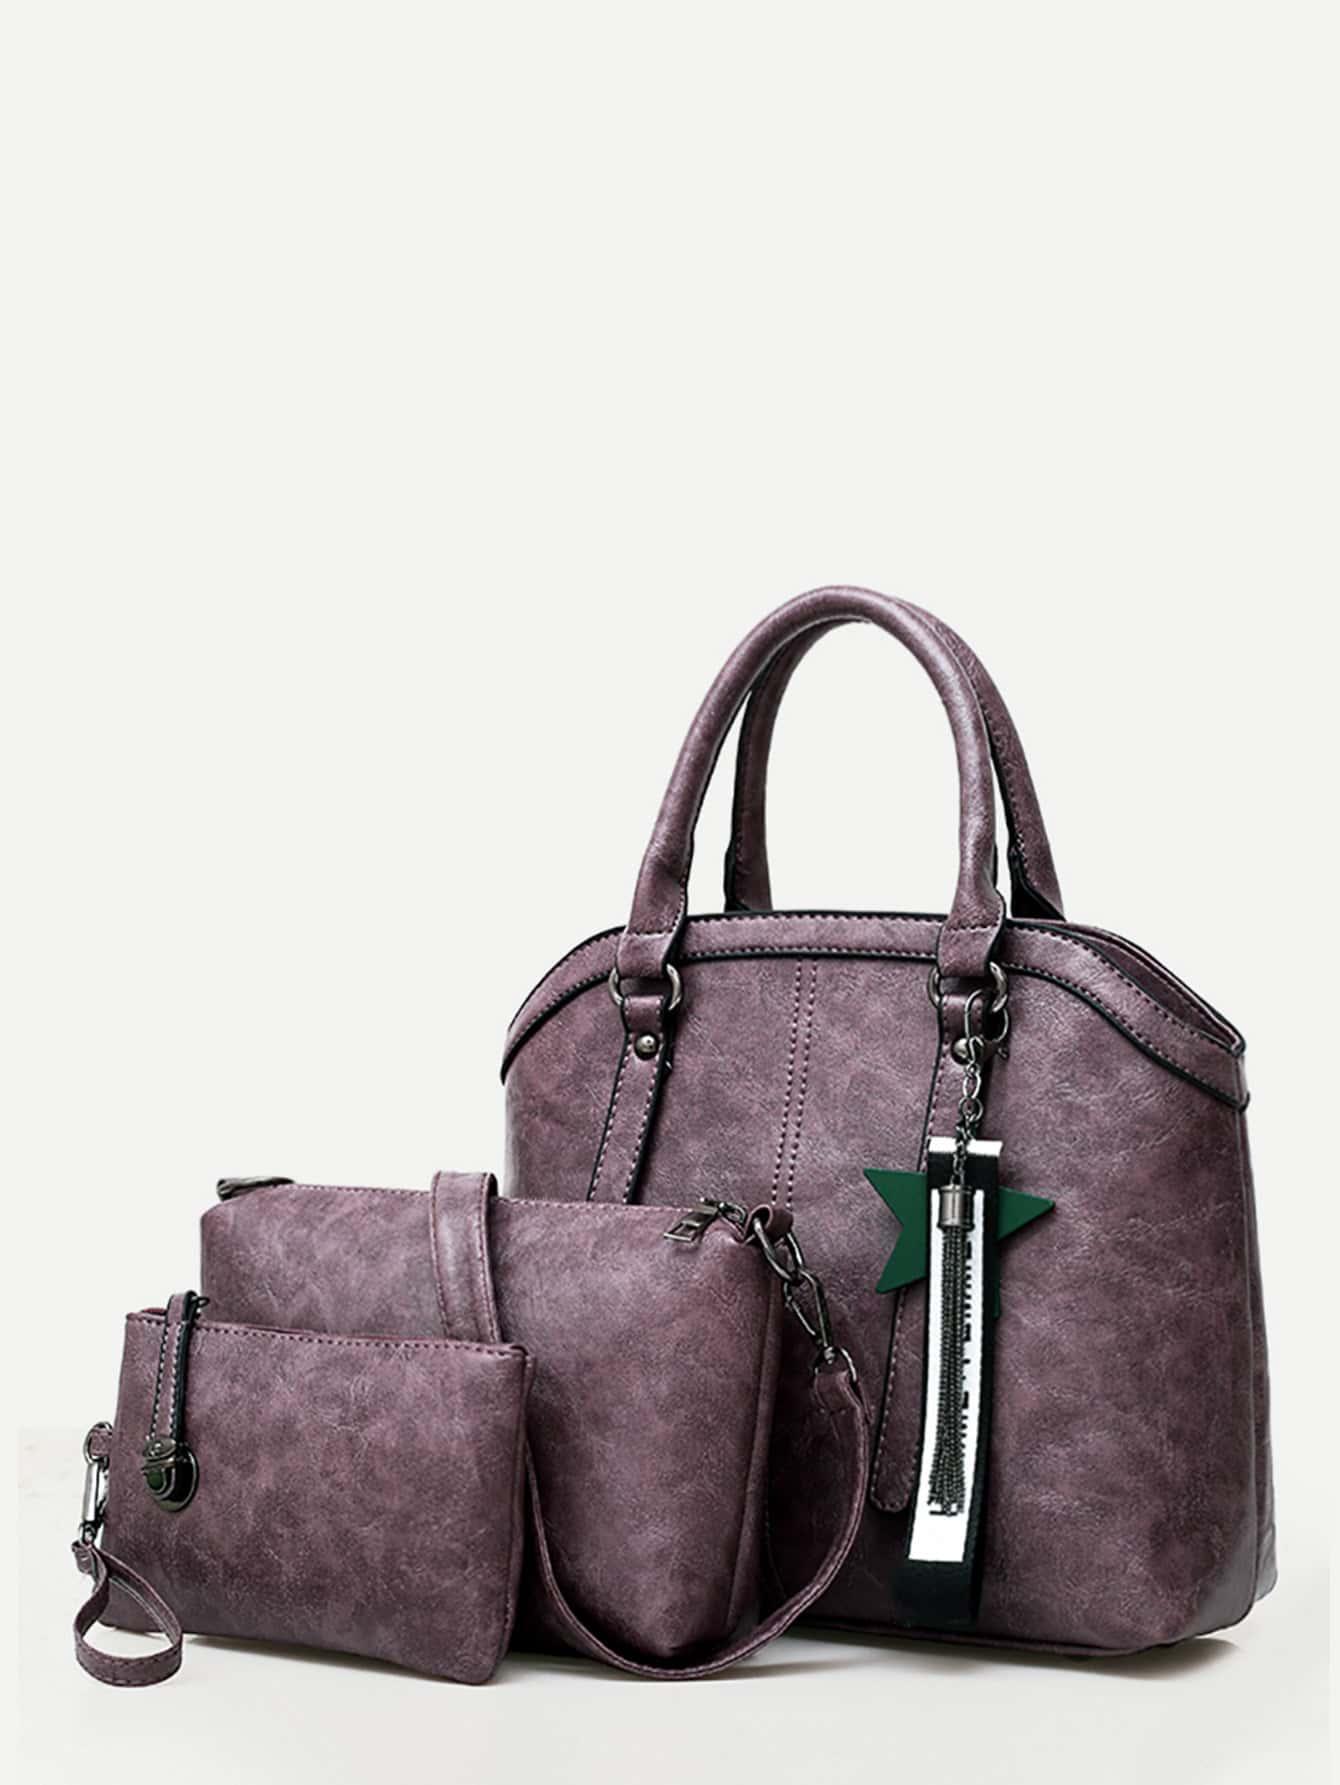 Tassel Charm Grab Bag 3Pcs